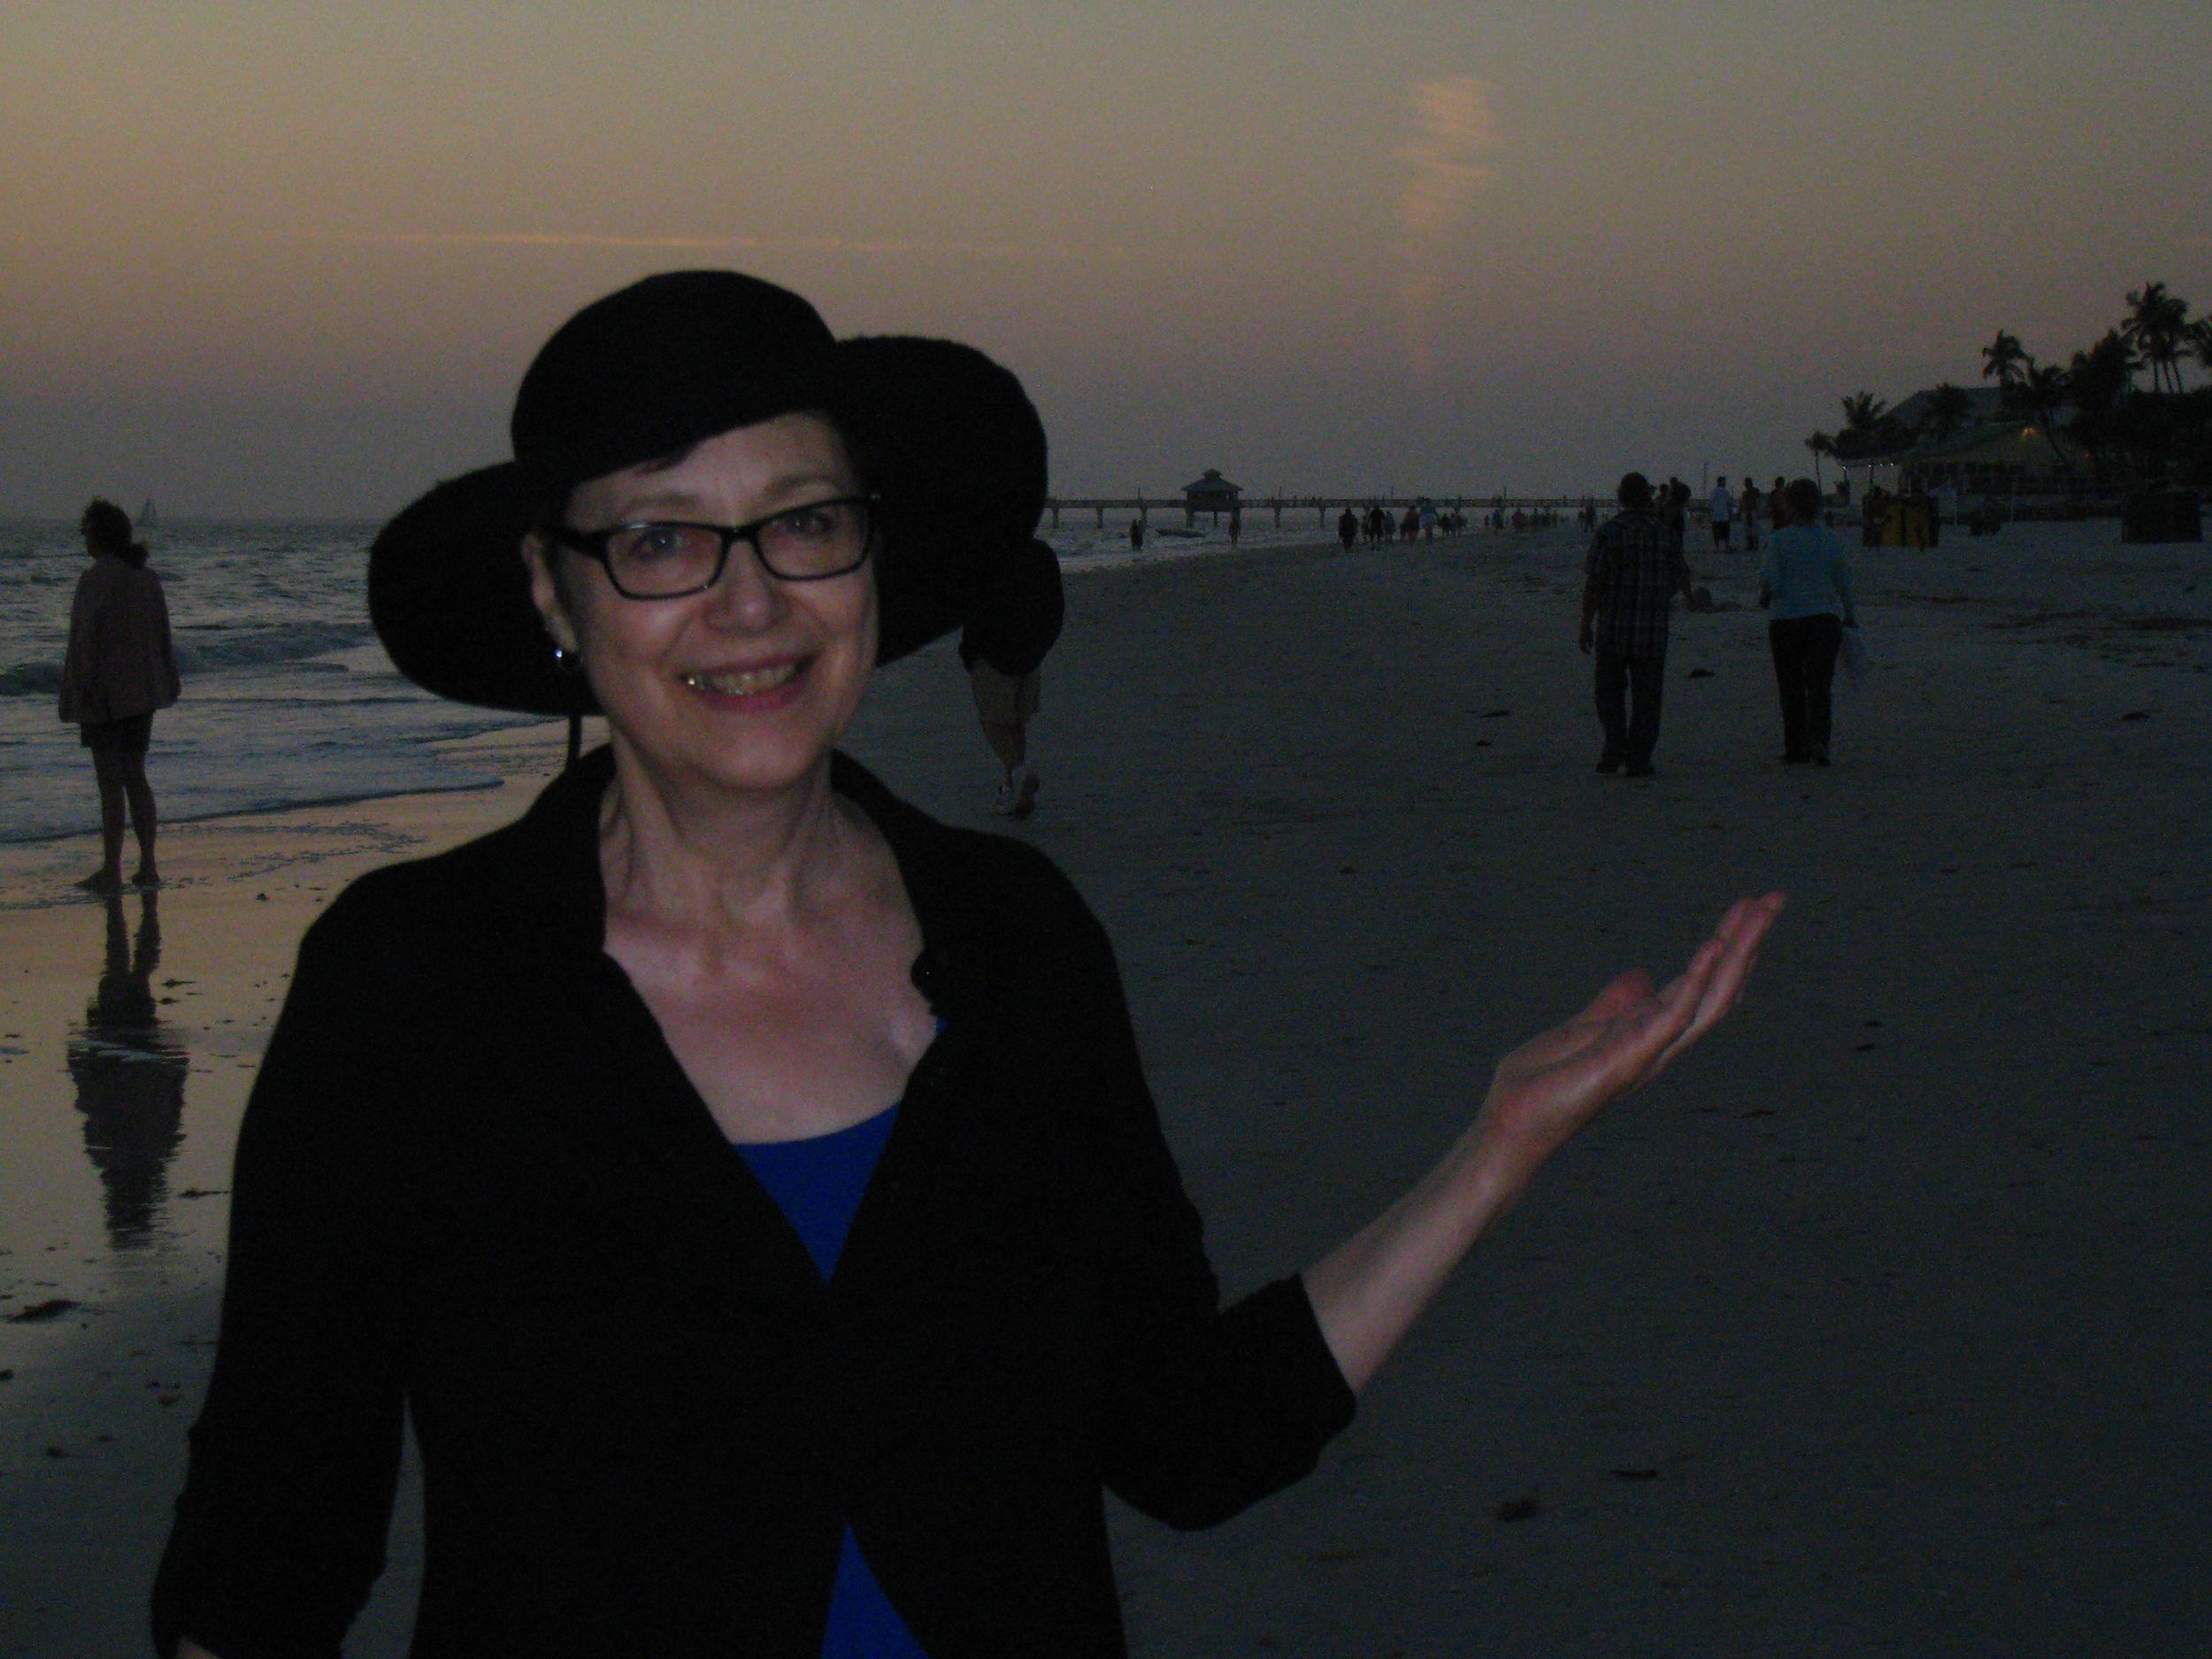 Loretta-On-the-Beach_2013-02-12_IMG-2257b.jpg